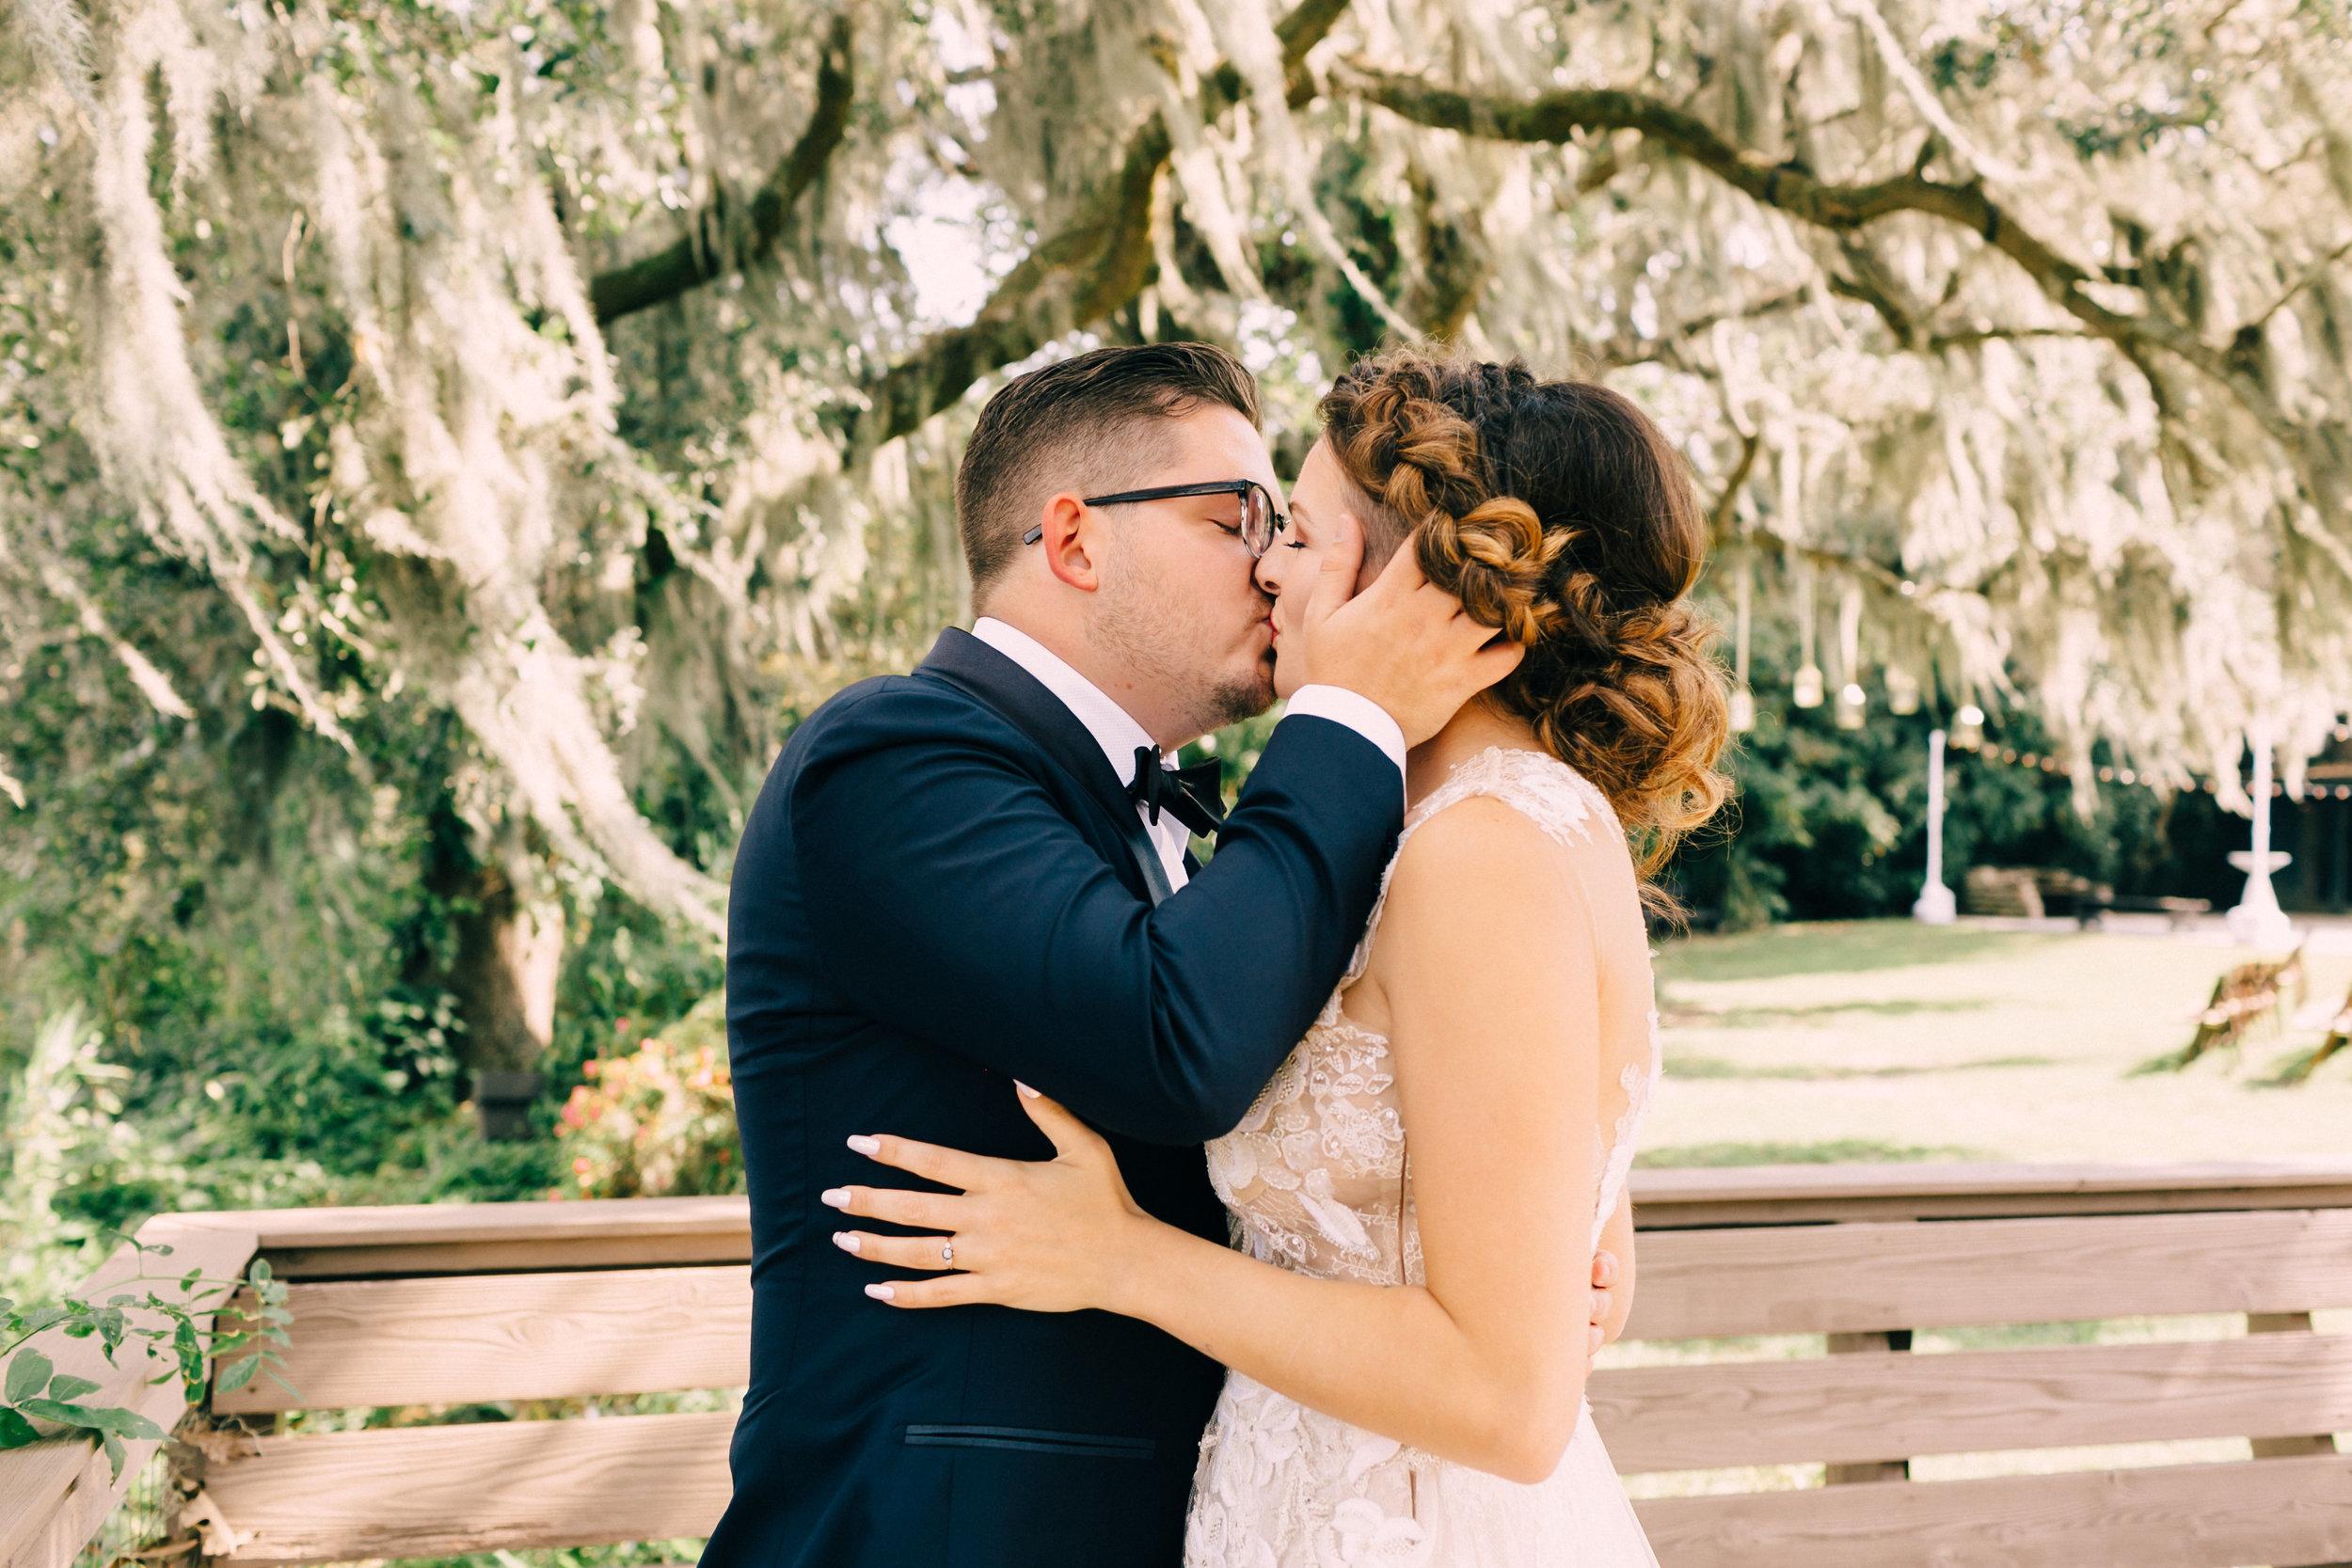 First Look First Kiss Wedding photo